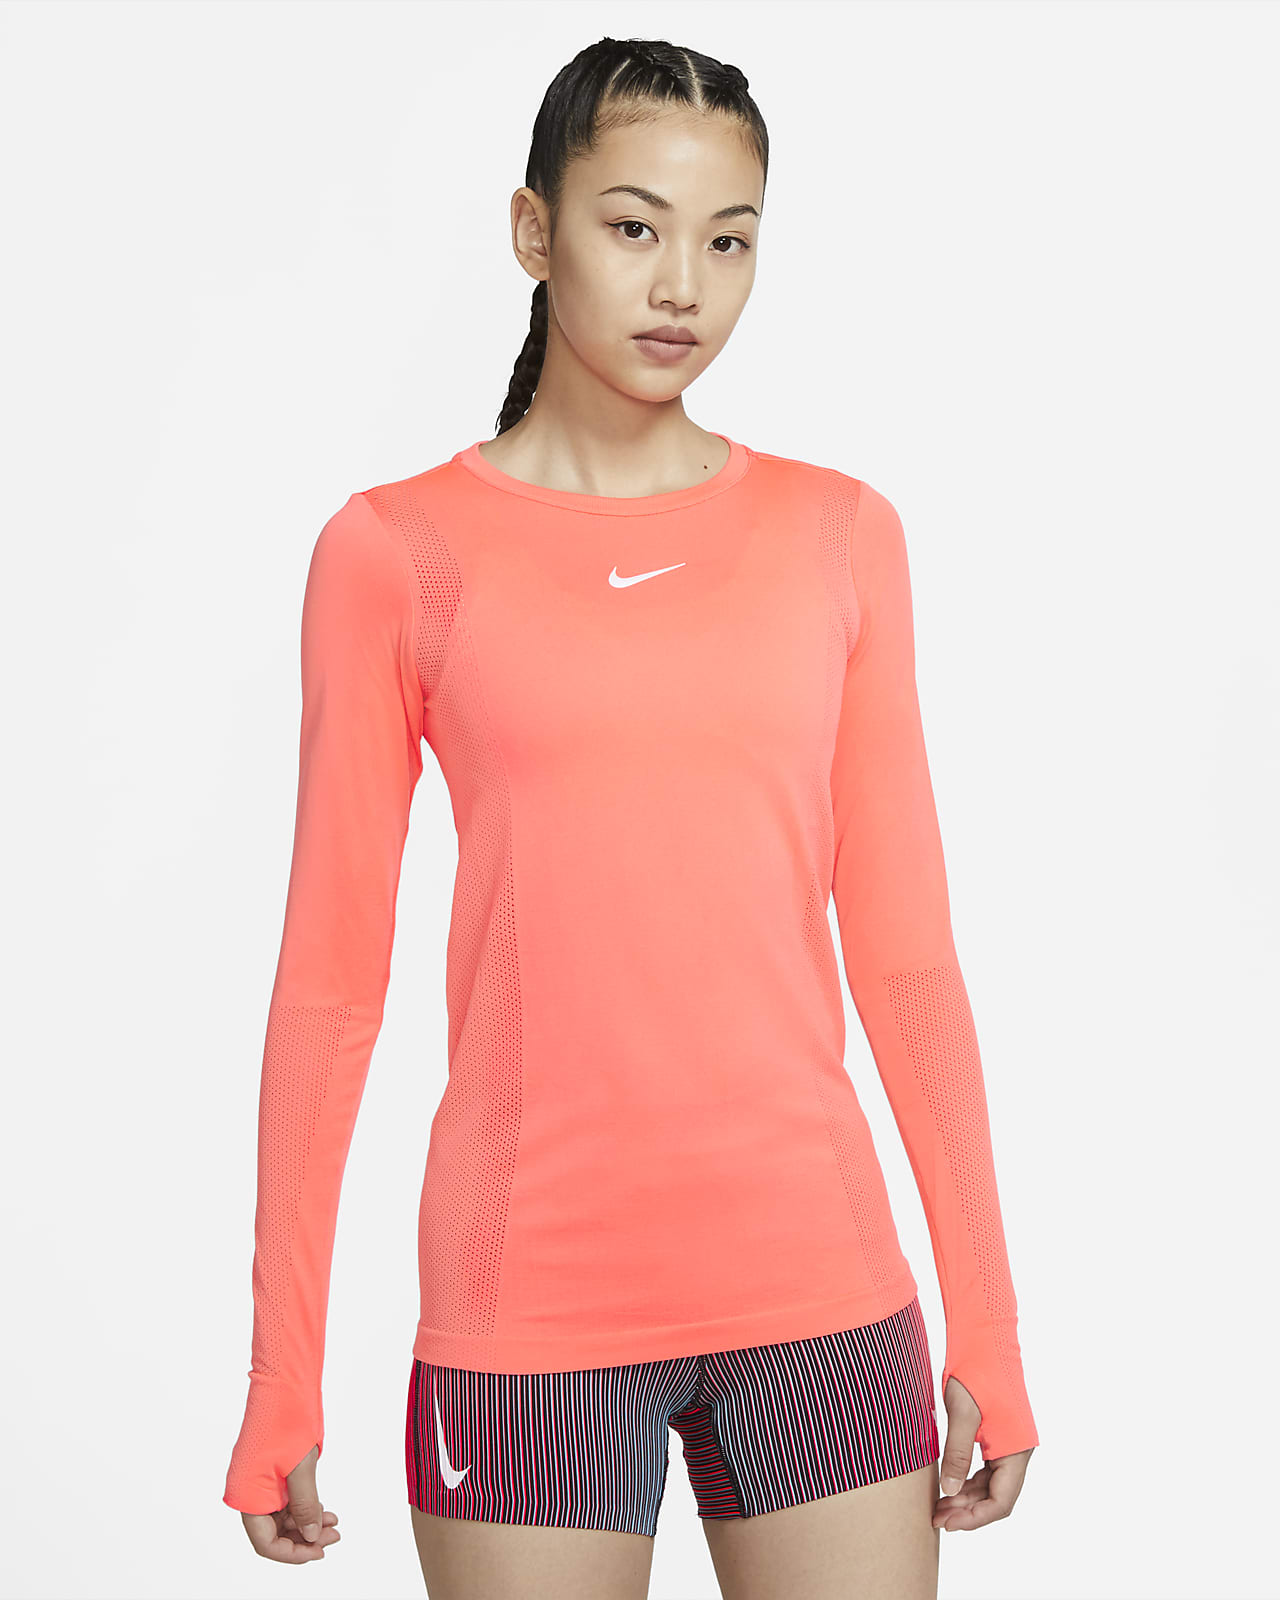 Nike Infinite 女子长袖跑步上衣